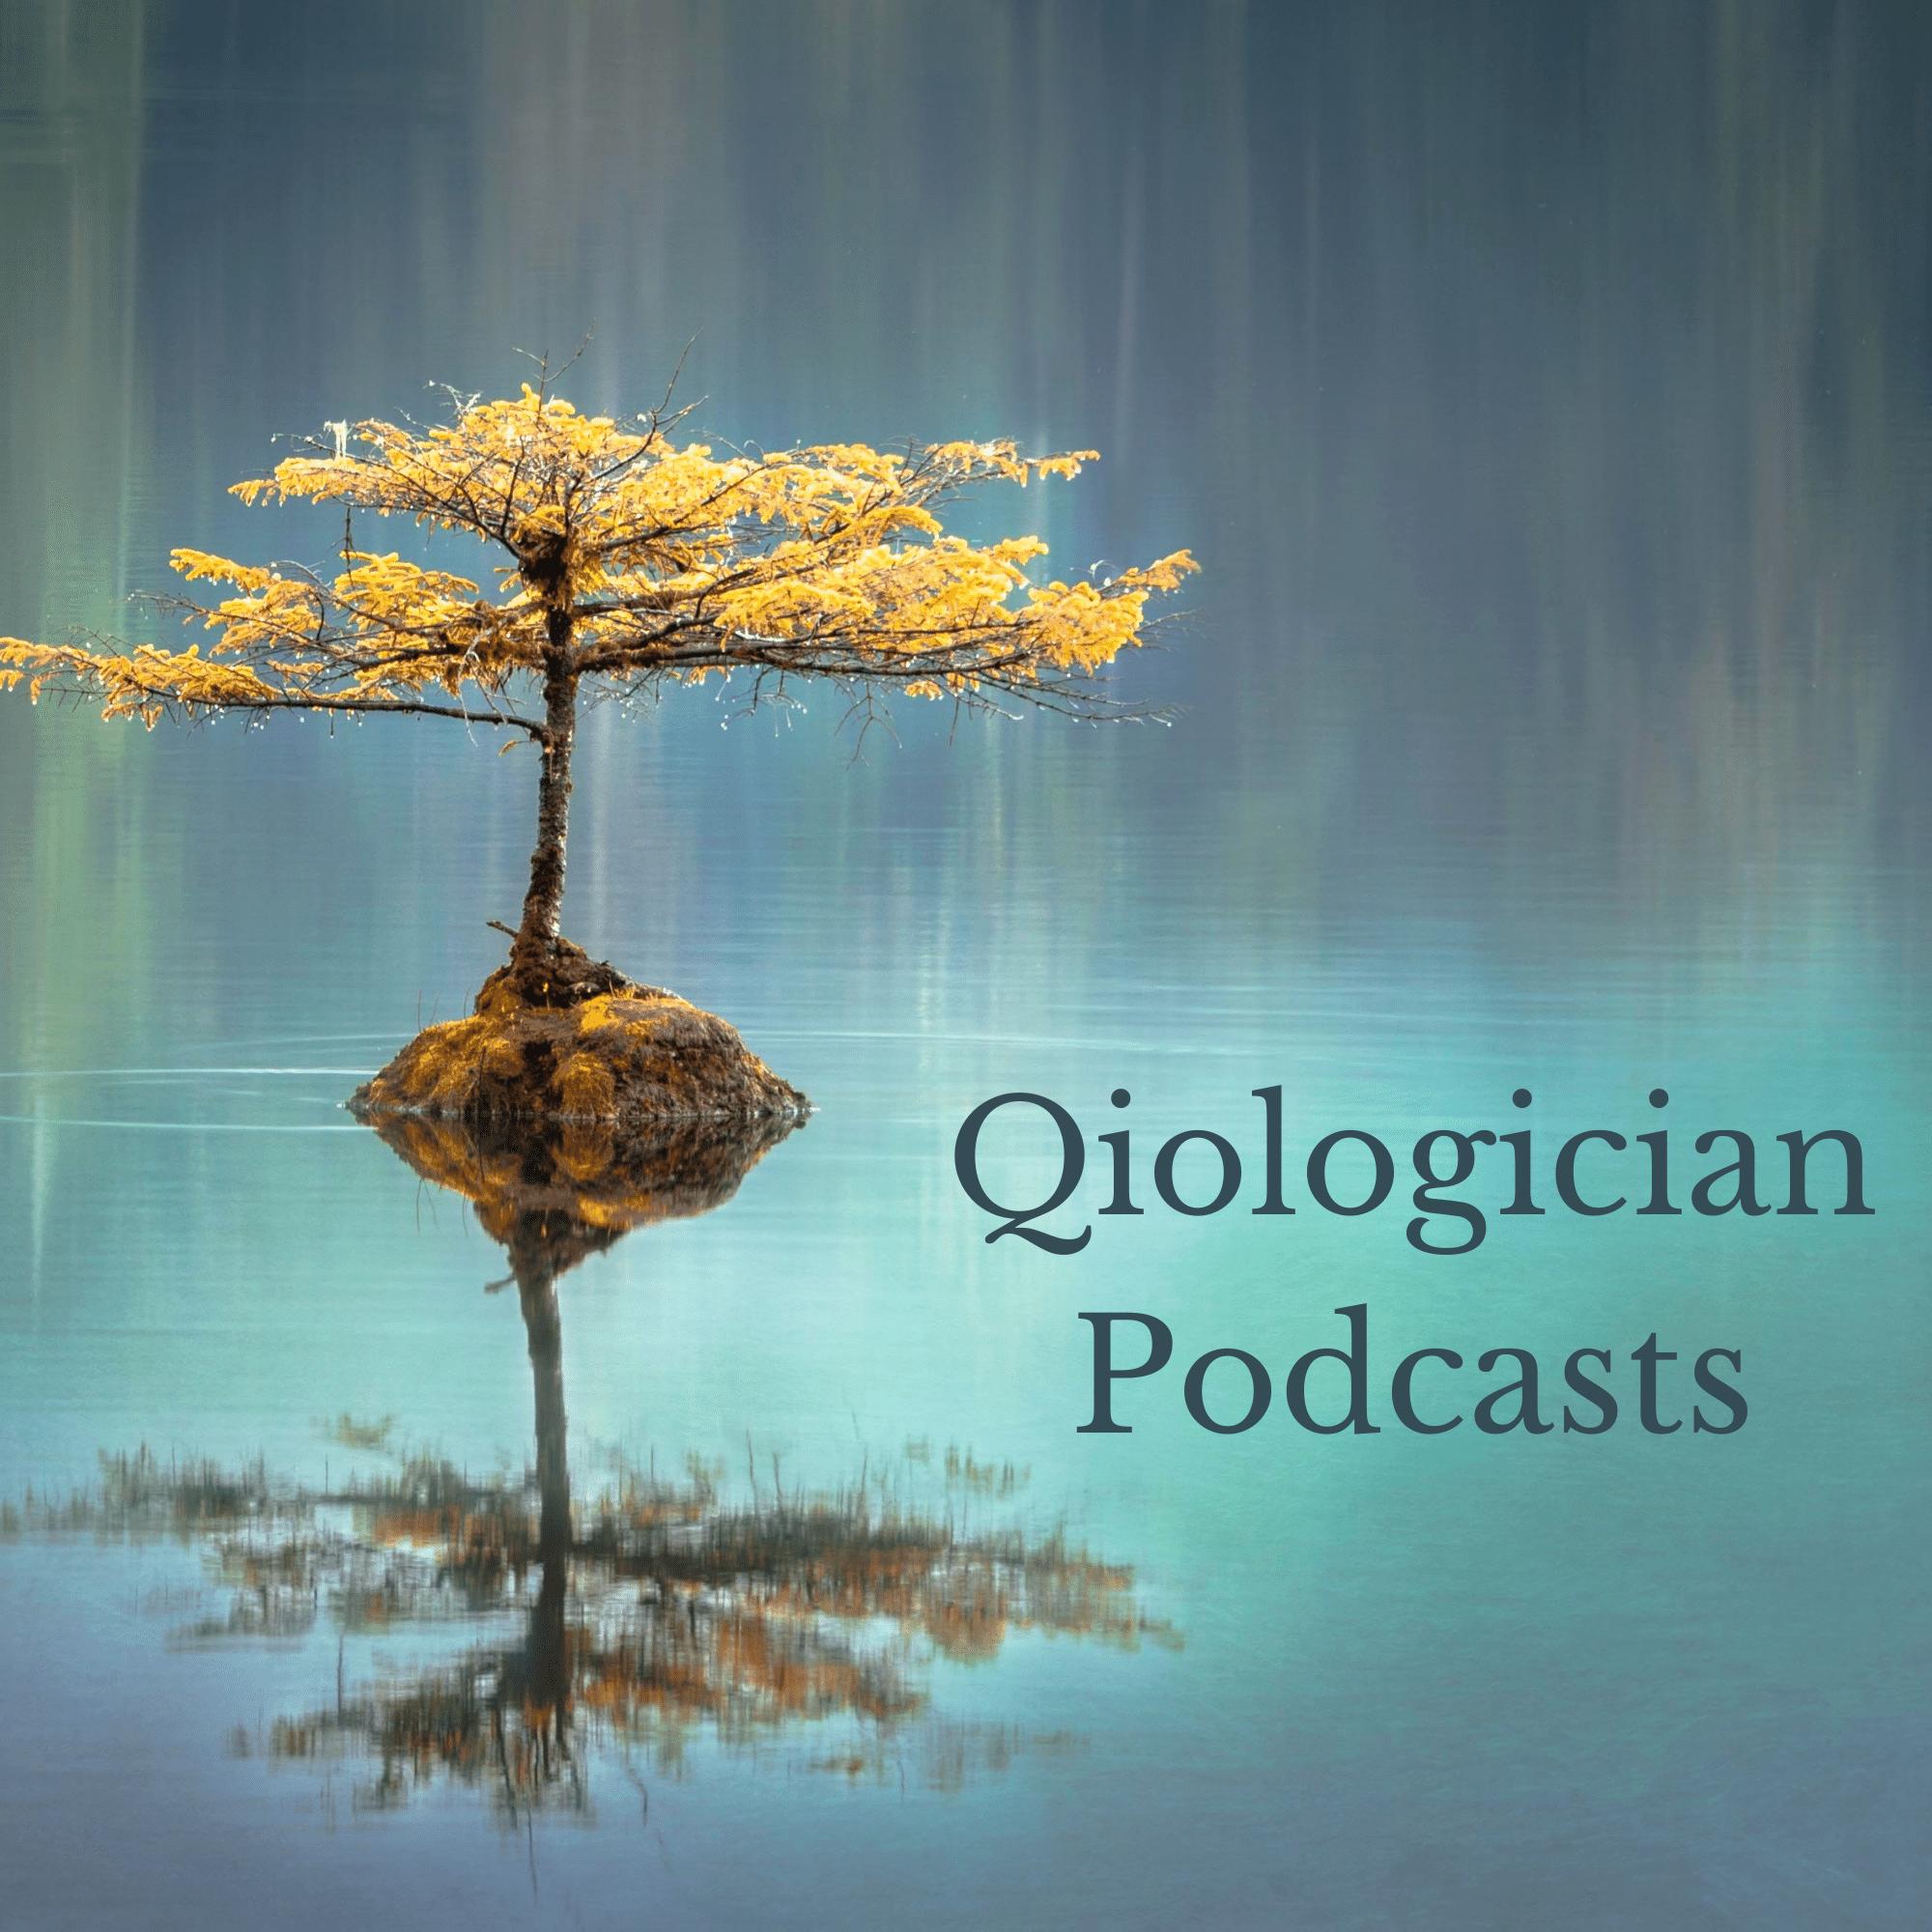 Artwork for podcast Qiological Podcast